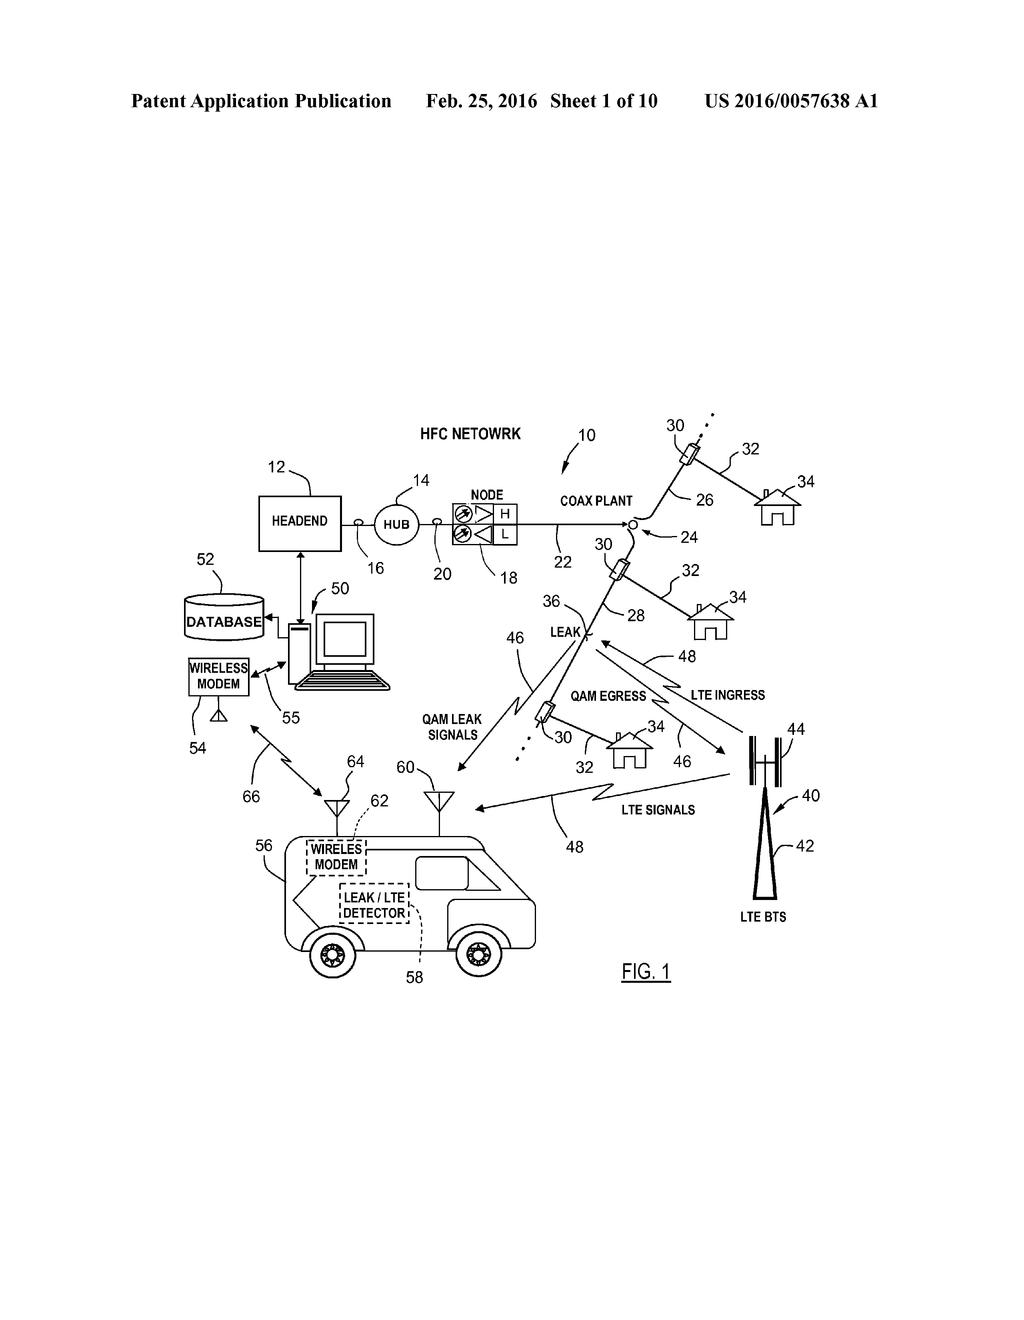 20160057638_02 prioritizing repair of signal leakage in an hfc network diagram